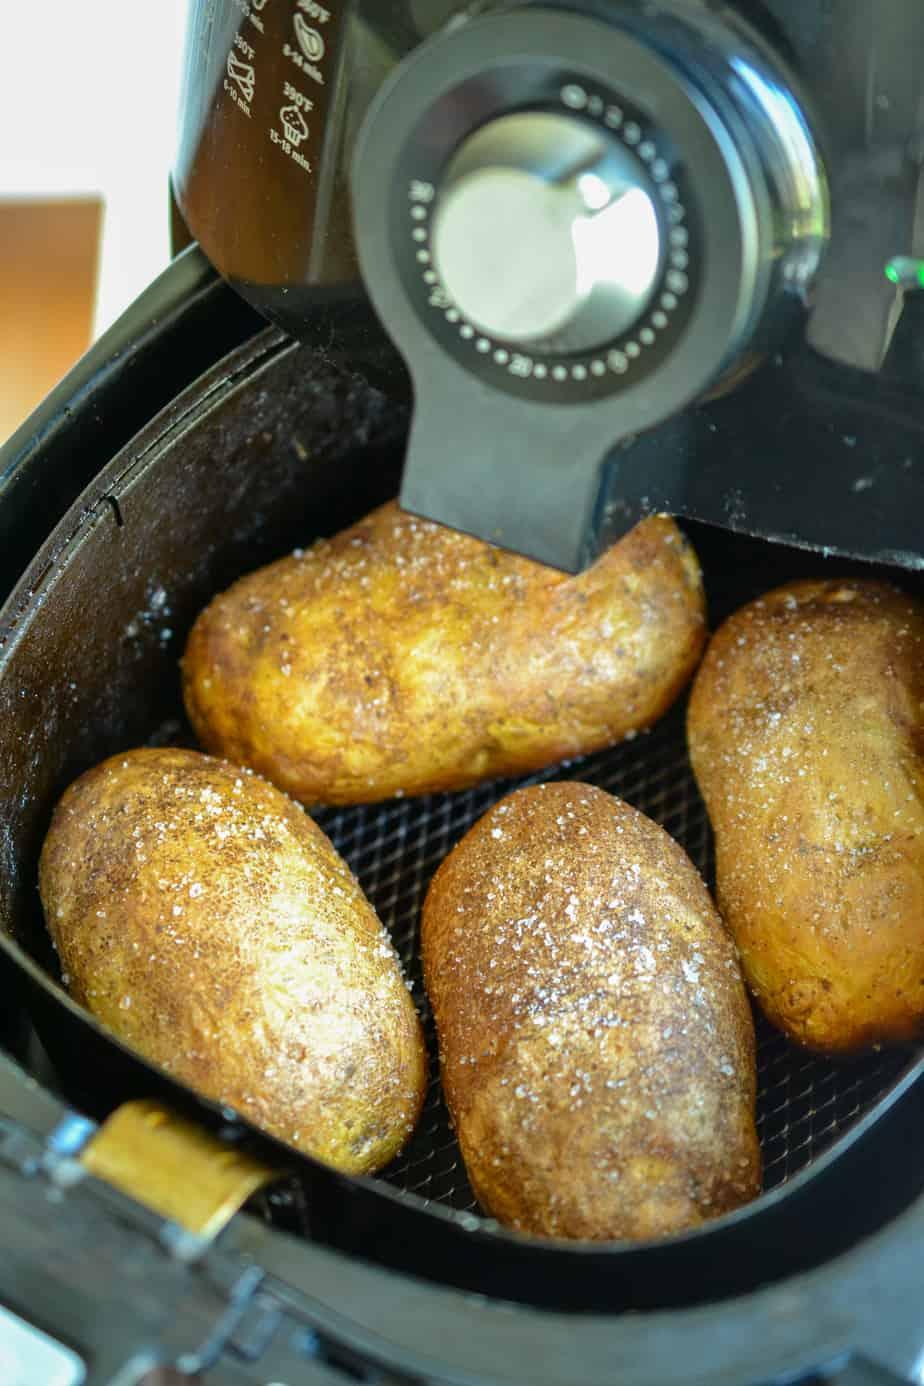 Four potatoes in an air fryer.